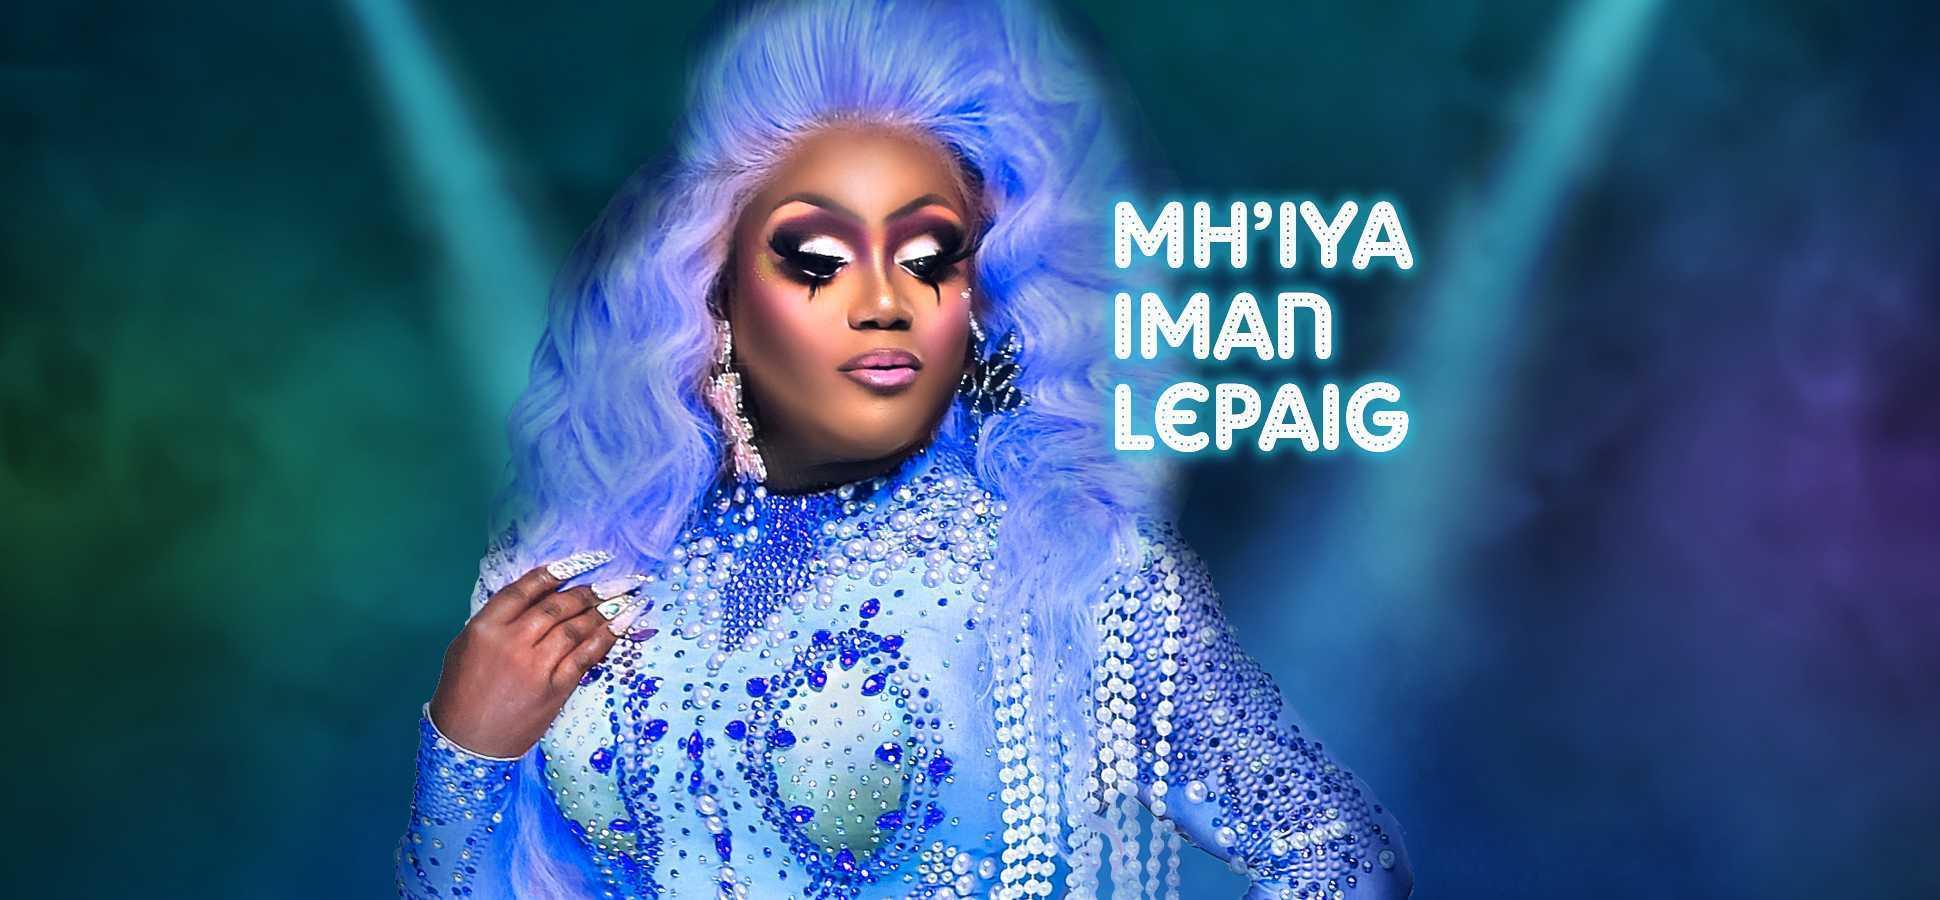 Mh'iya Iman LePaige